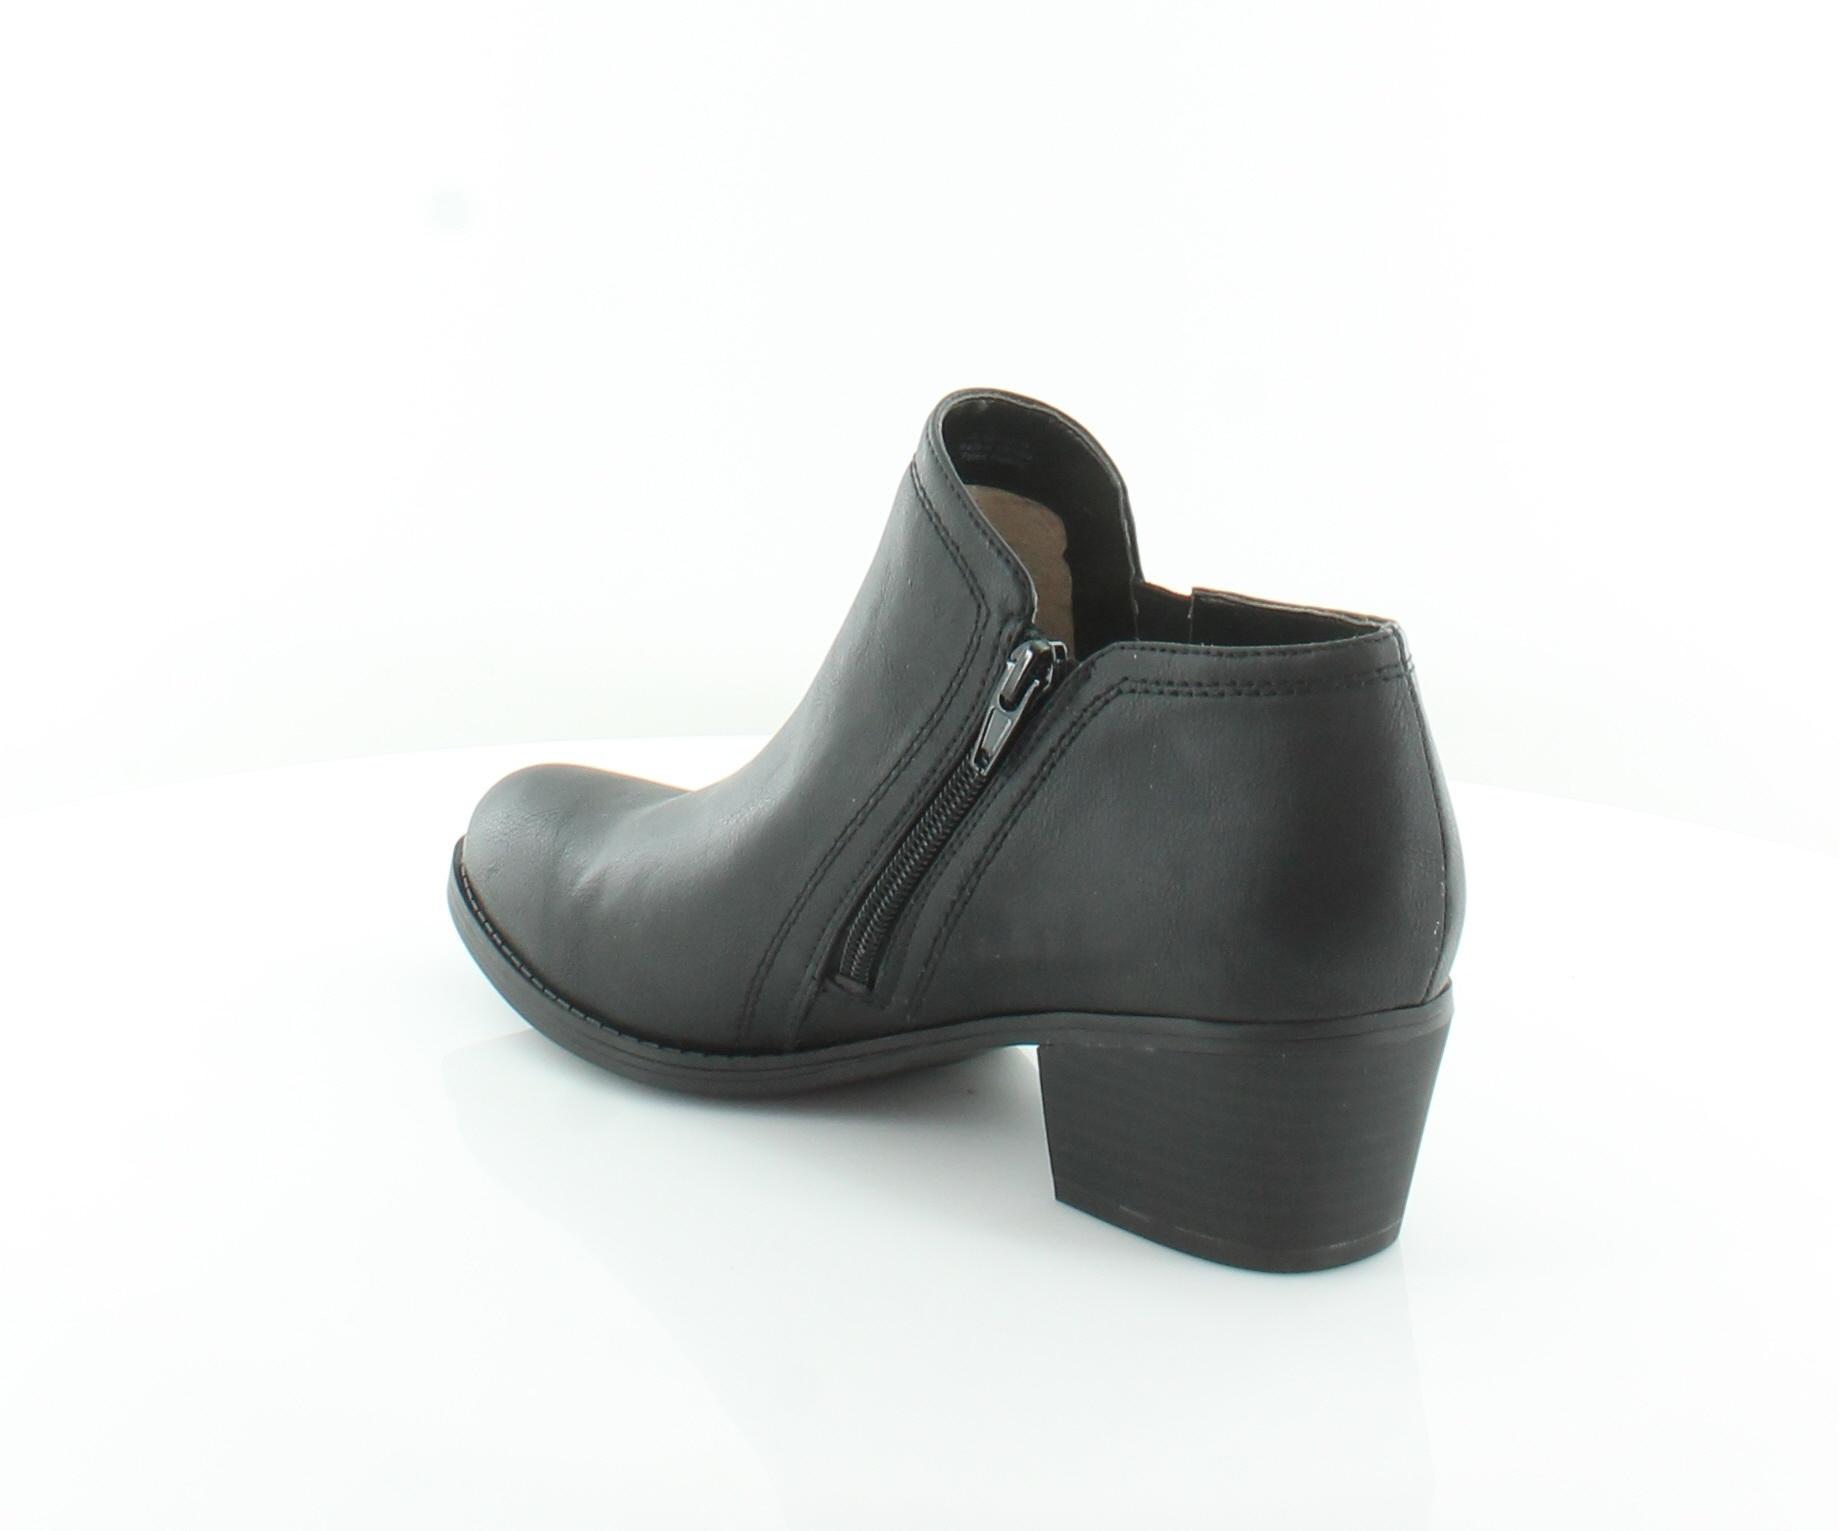 Naturalizer-Wonda2-Women-039-s-Boots-Black thumbnail 5